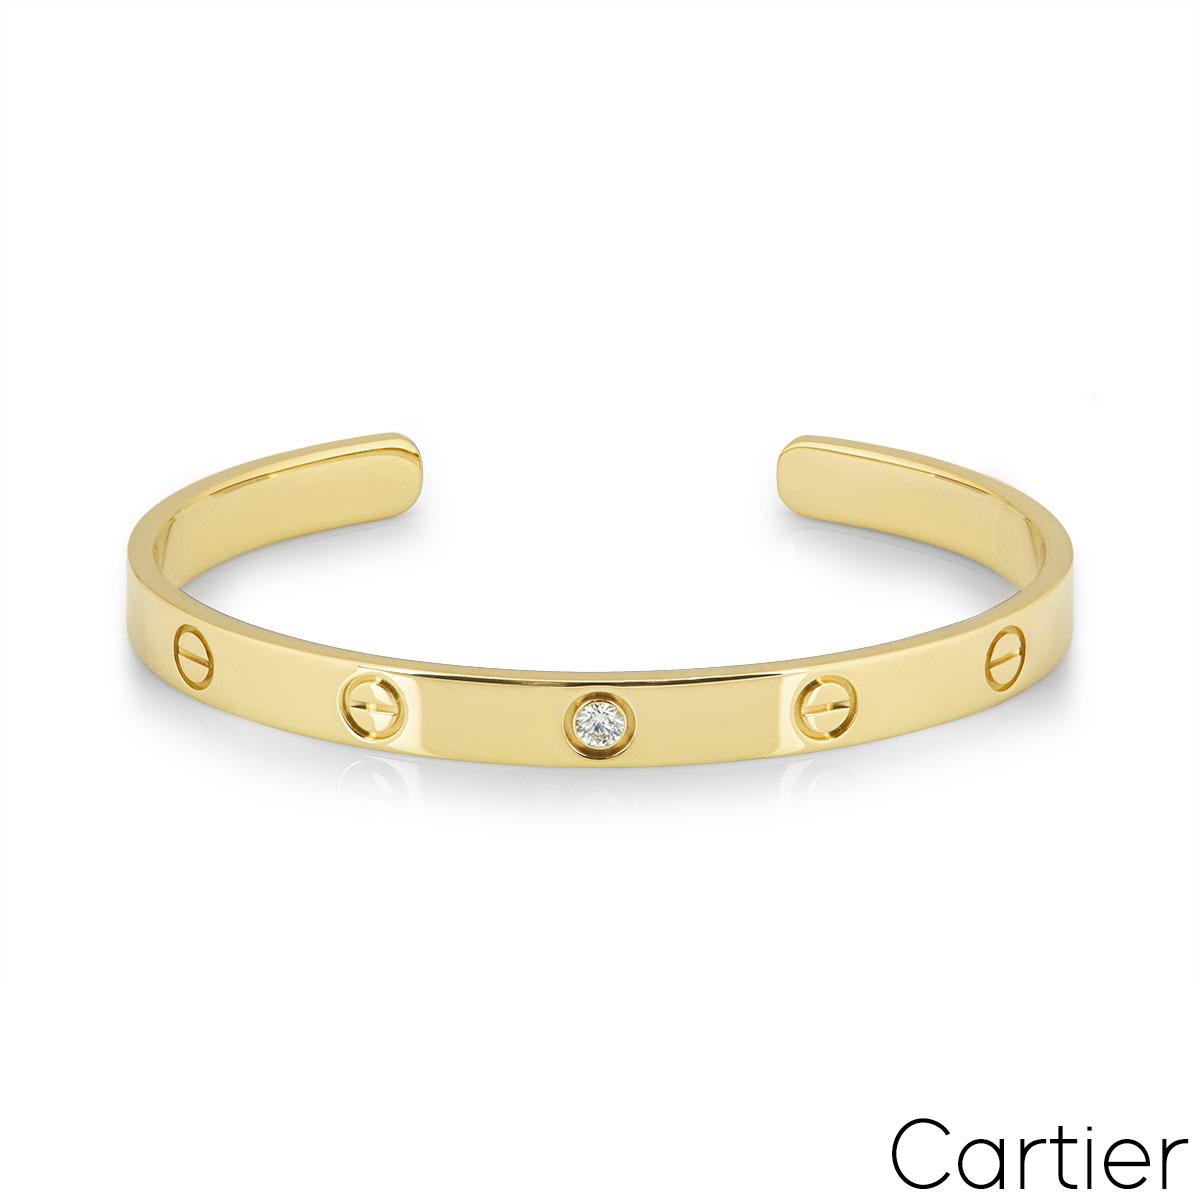 Cartier Yellow Gold Diamond Love Cuff Bracelet Size 17 B6029817